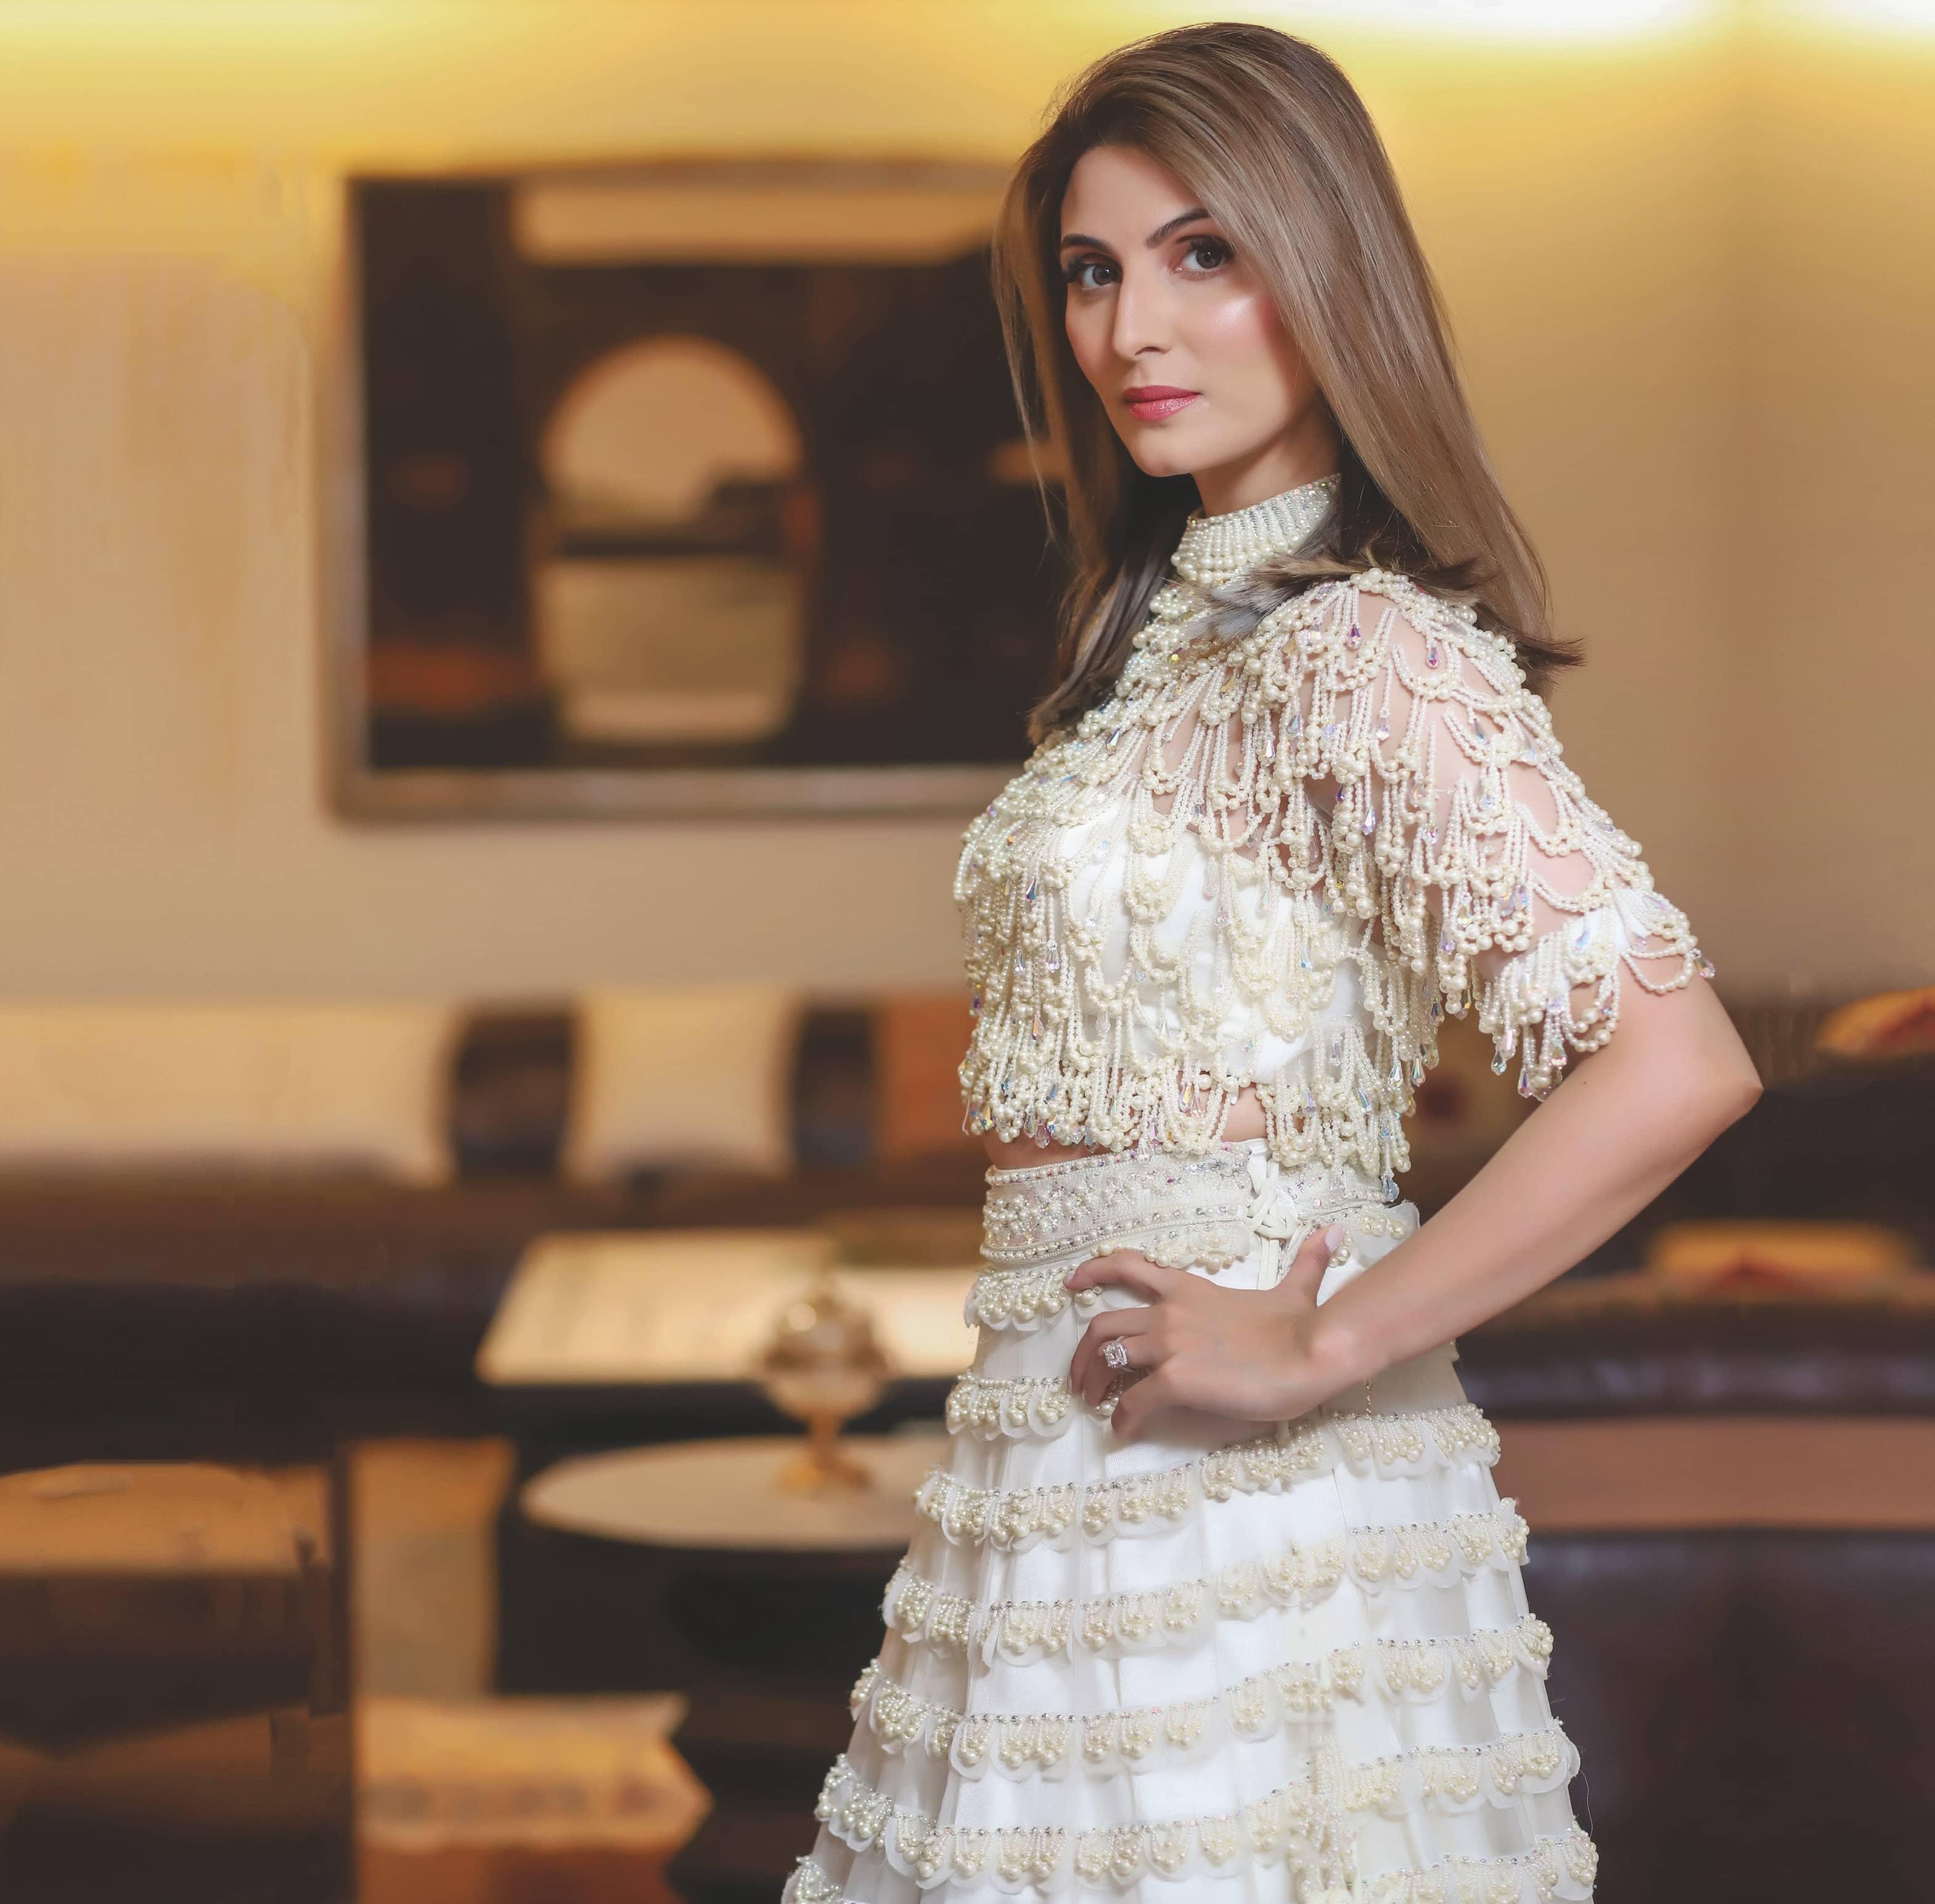 The Effortlessly Elegant Life Of Riddhima Kapoor Sahni